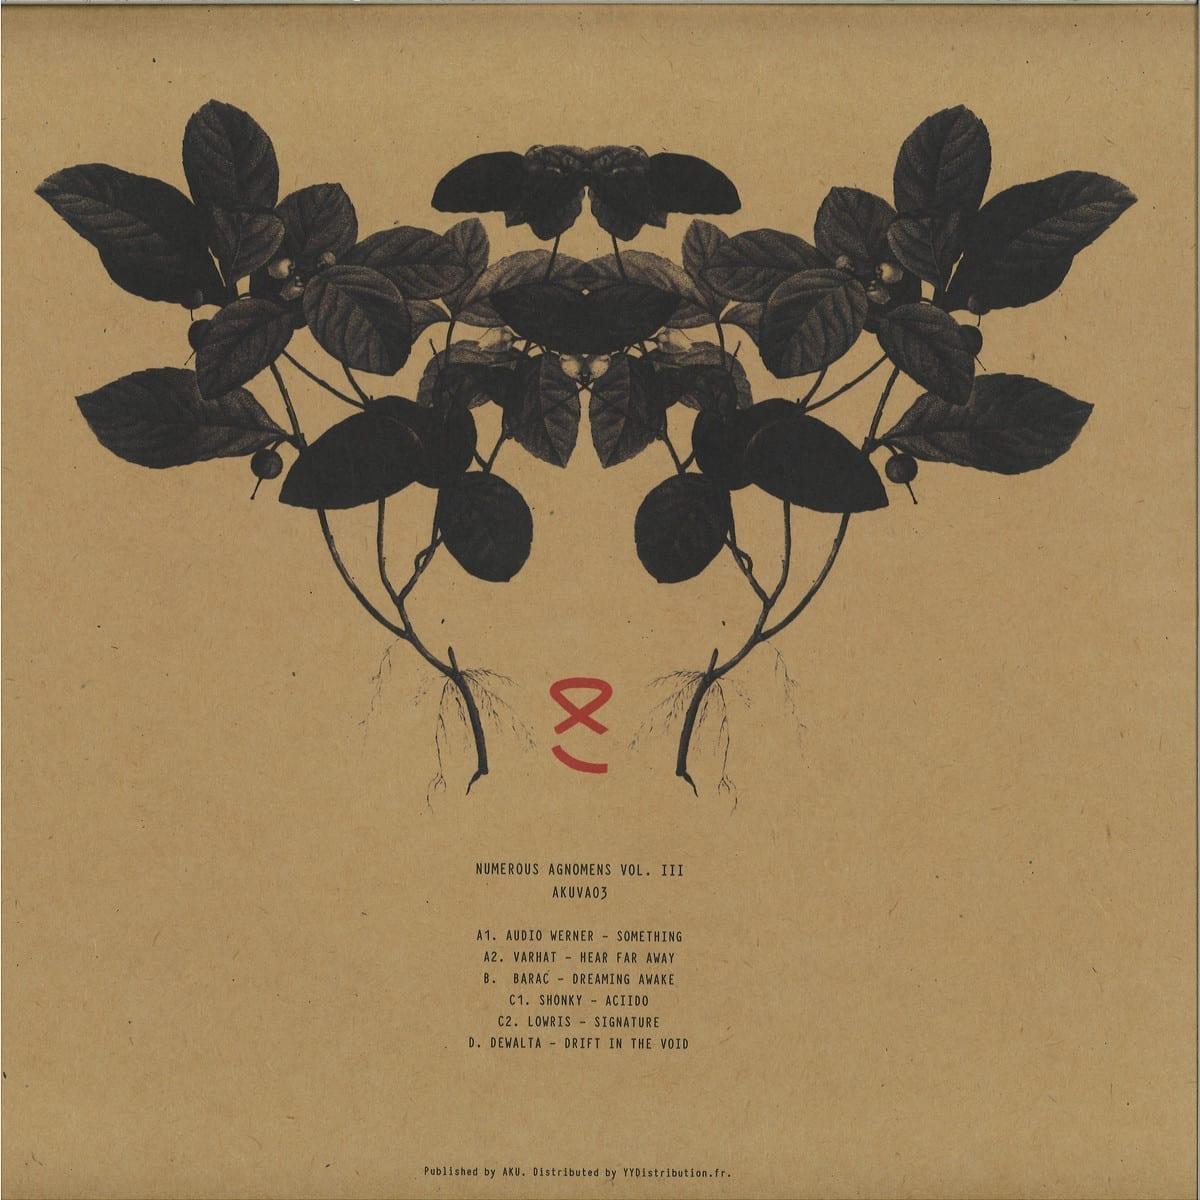 Various Artists - Numerous Agnomens Vol III [Aku] back